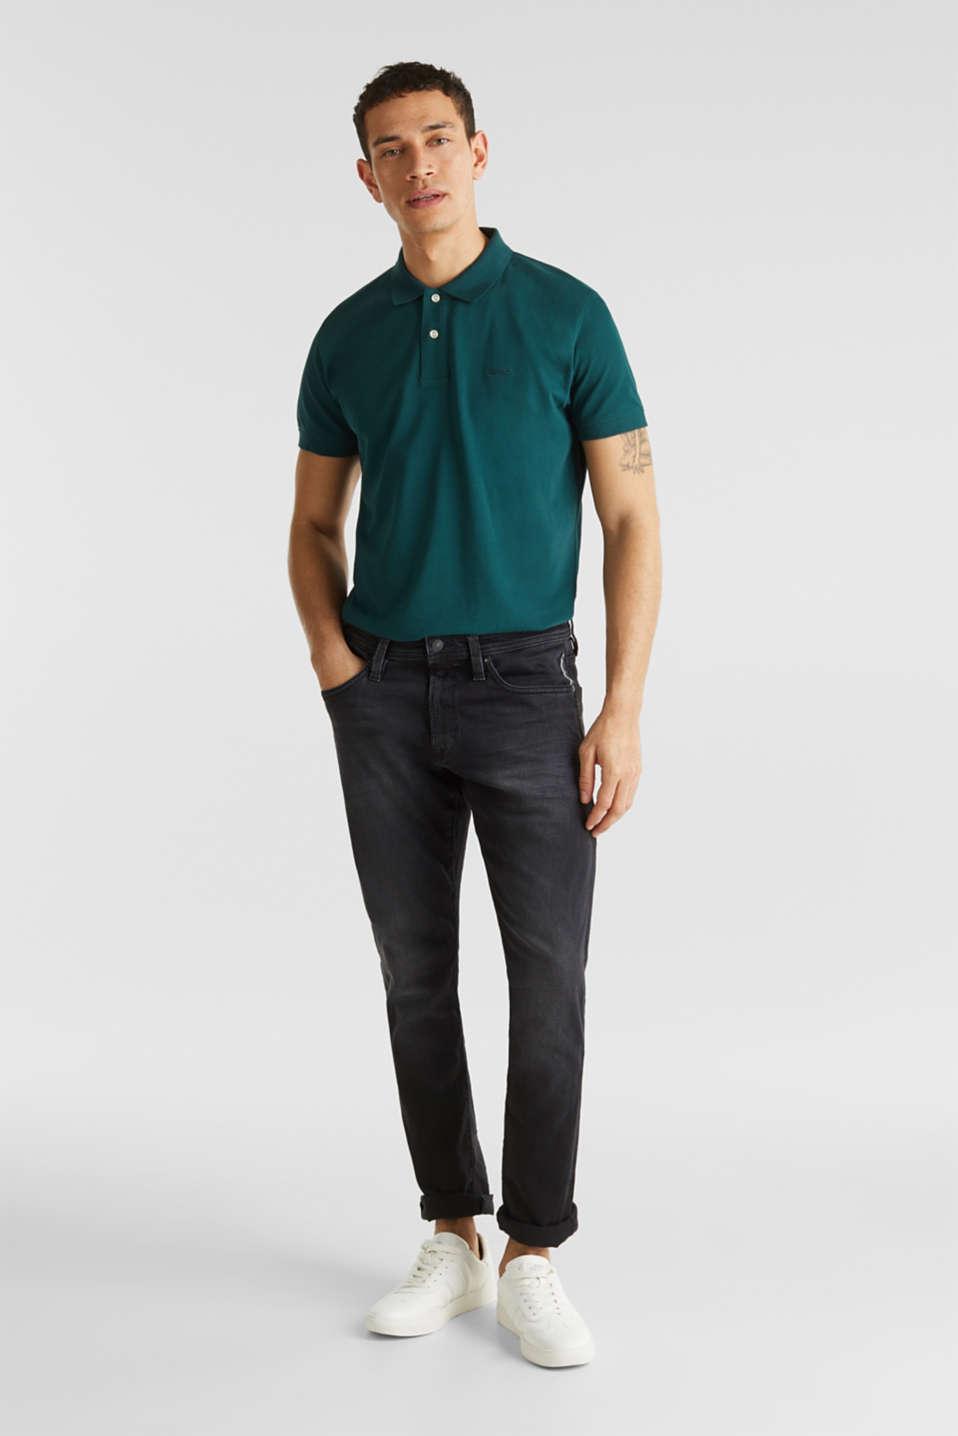 Pants denim Slim fit, BLACK DARK WASH, detail image number 2